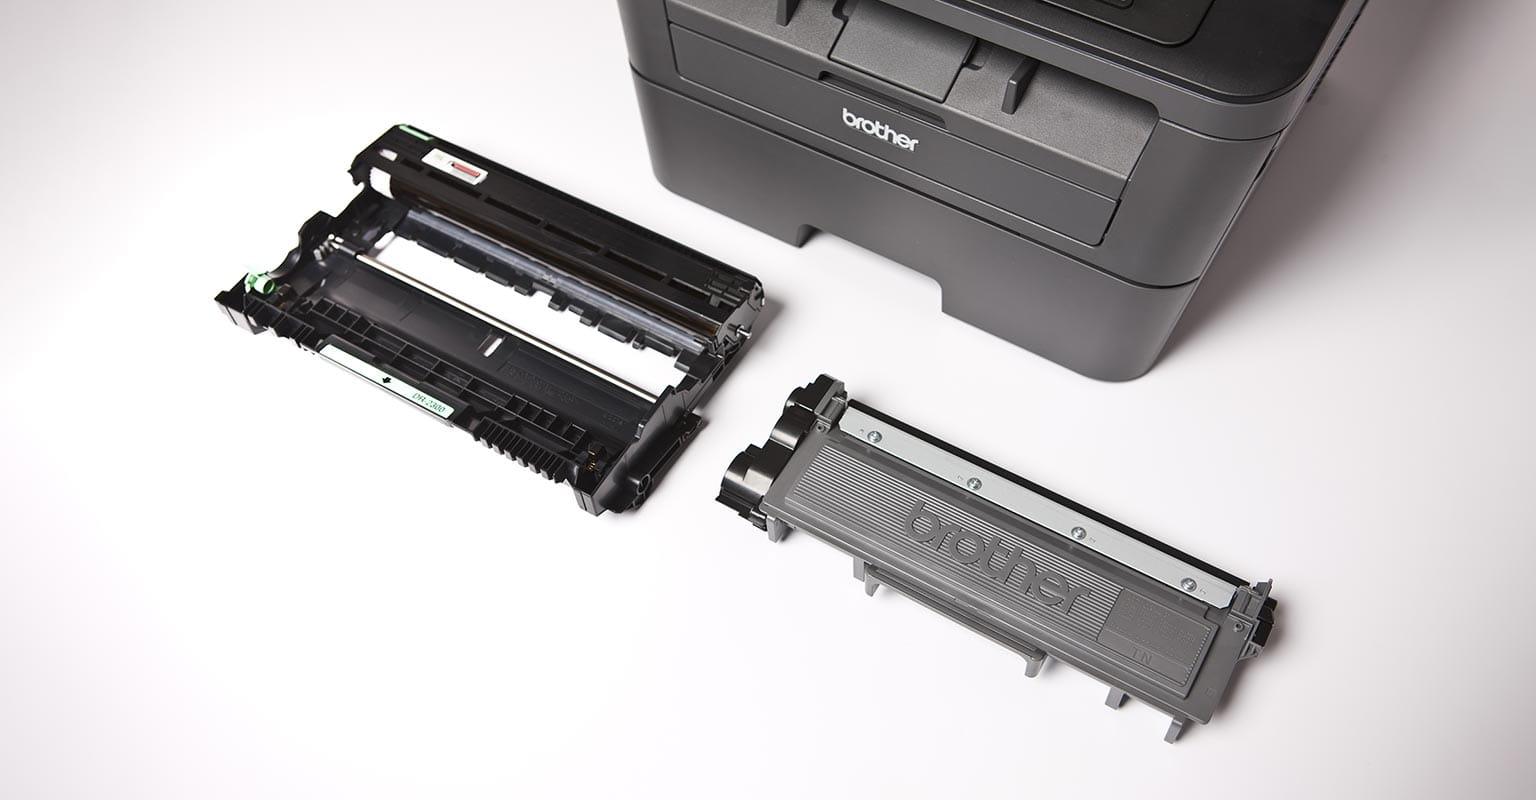 Brother L2540 mono laser printer with toner cartridge